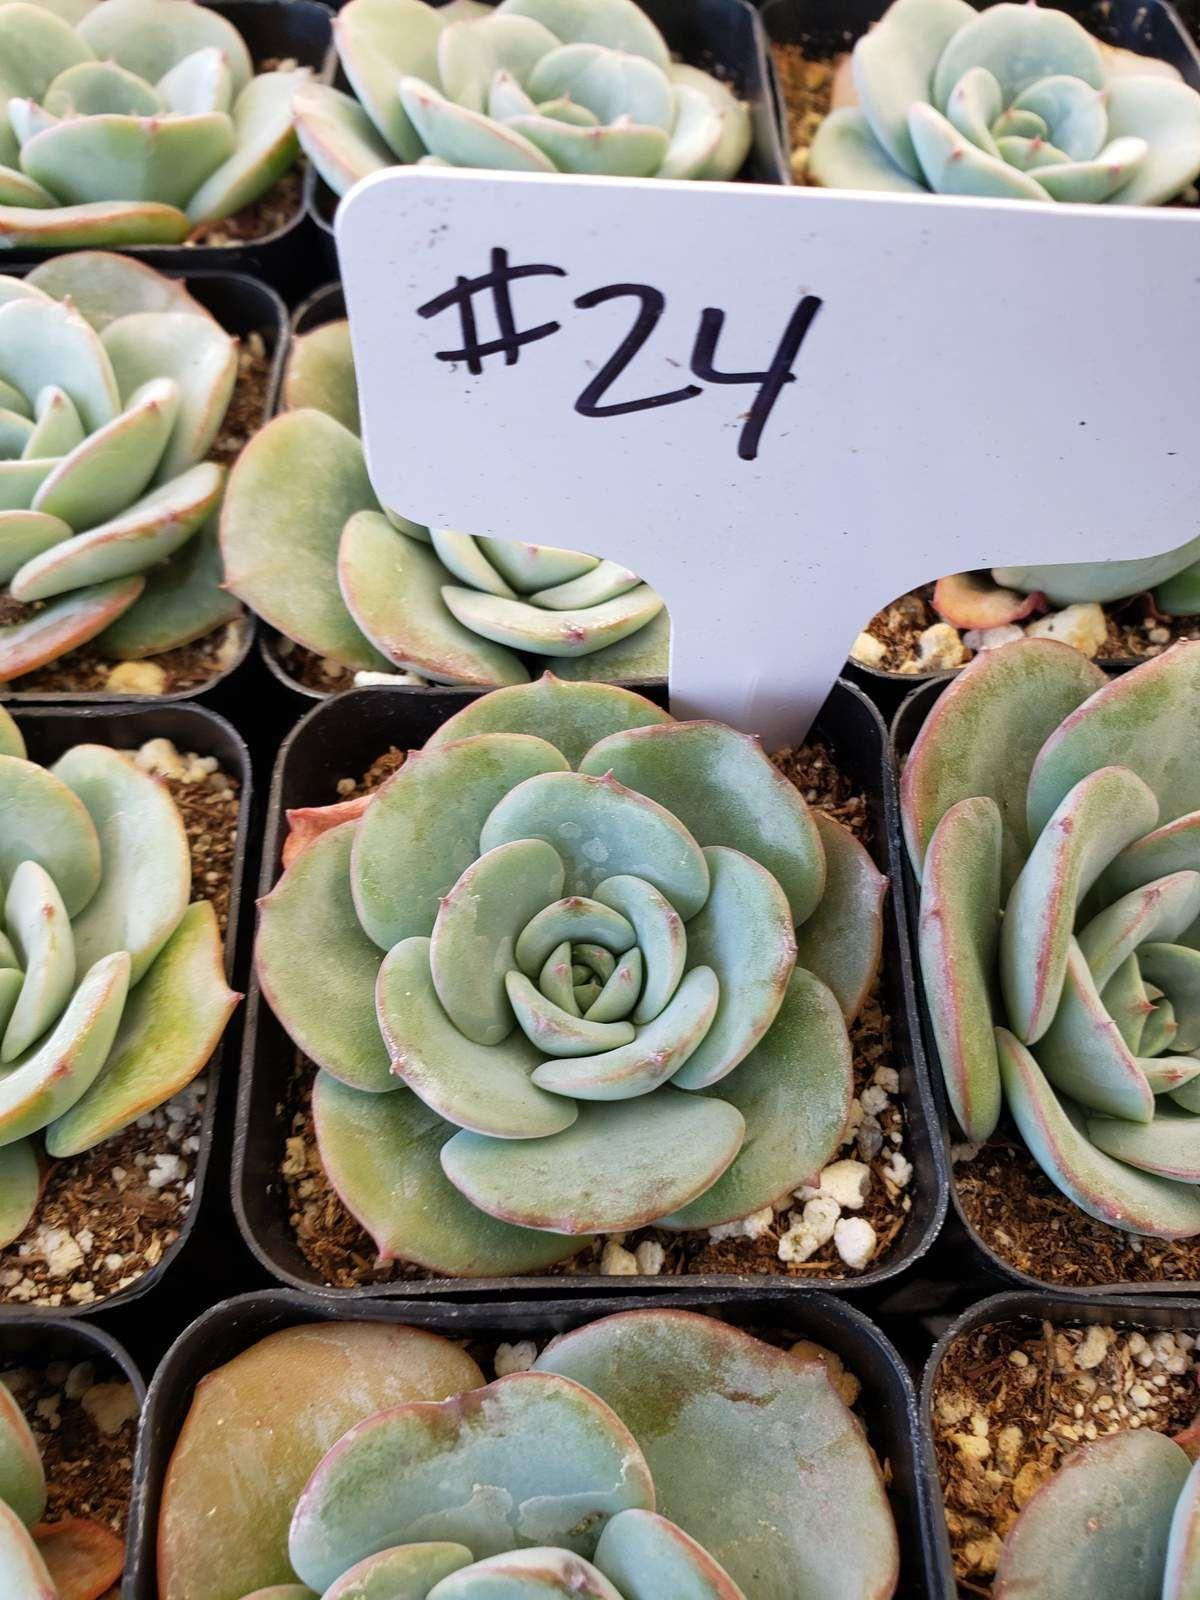 "2"" Exact Type Succulents Wedding Succulent Favors for"